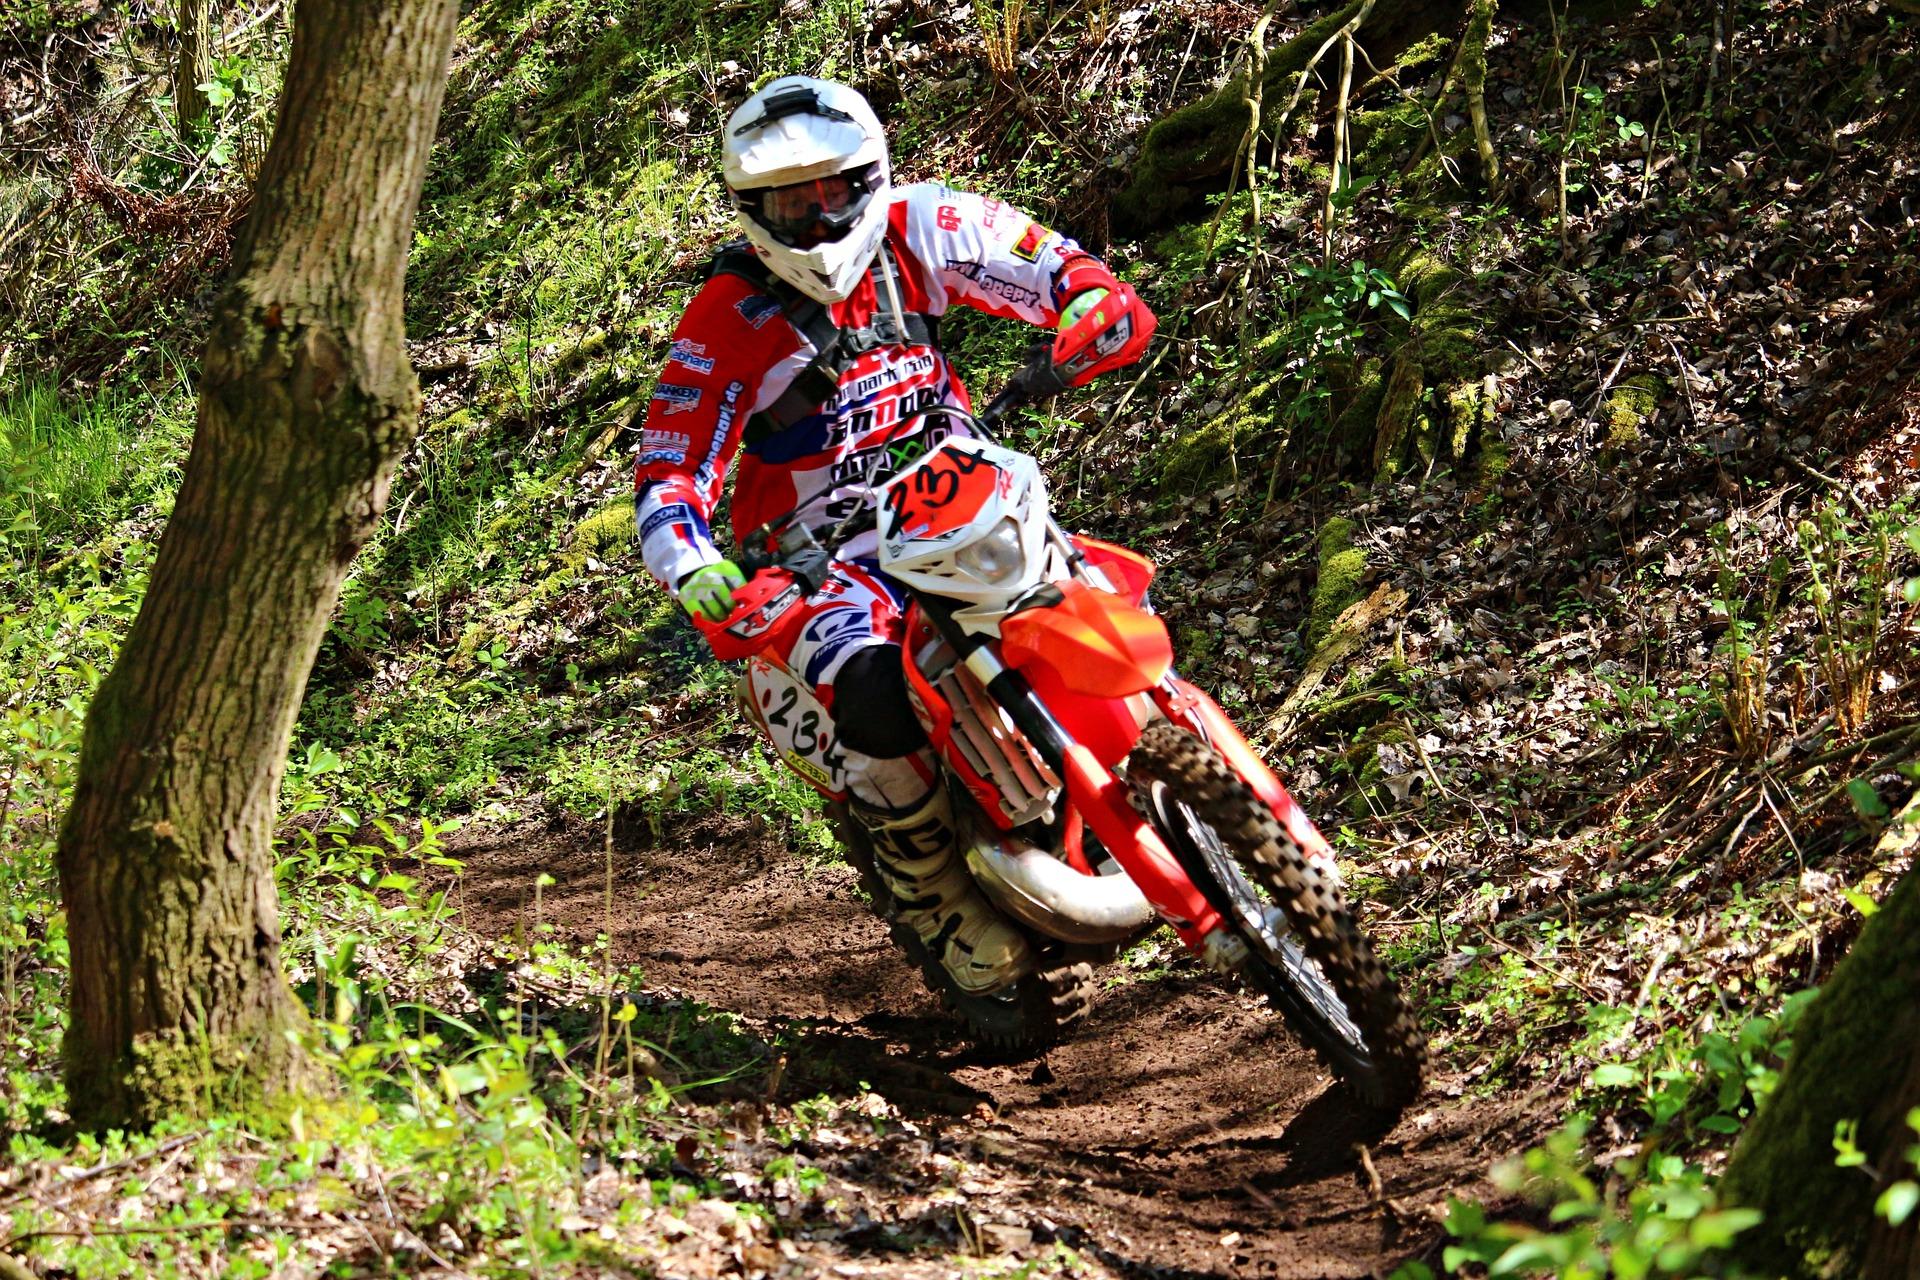 moto, Enduro,  Motocross, rischio, campo, casco - Sfondi HD - Professor-falken.com